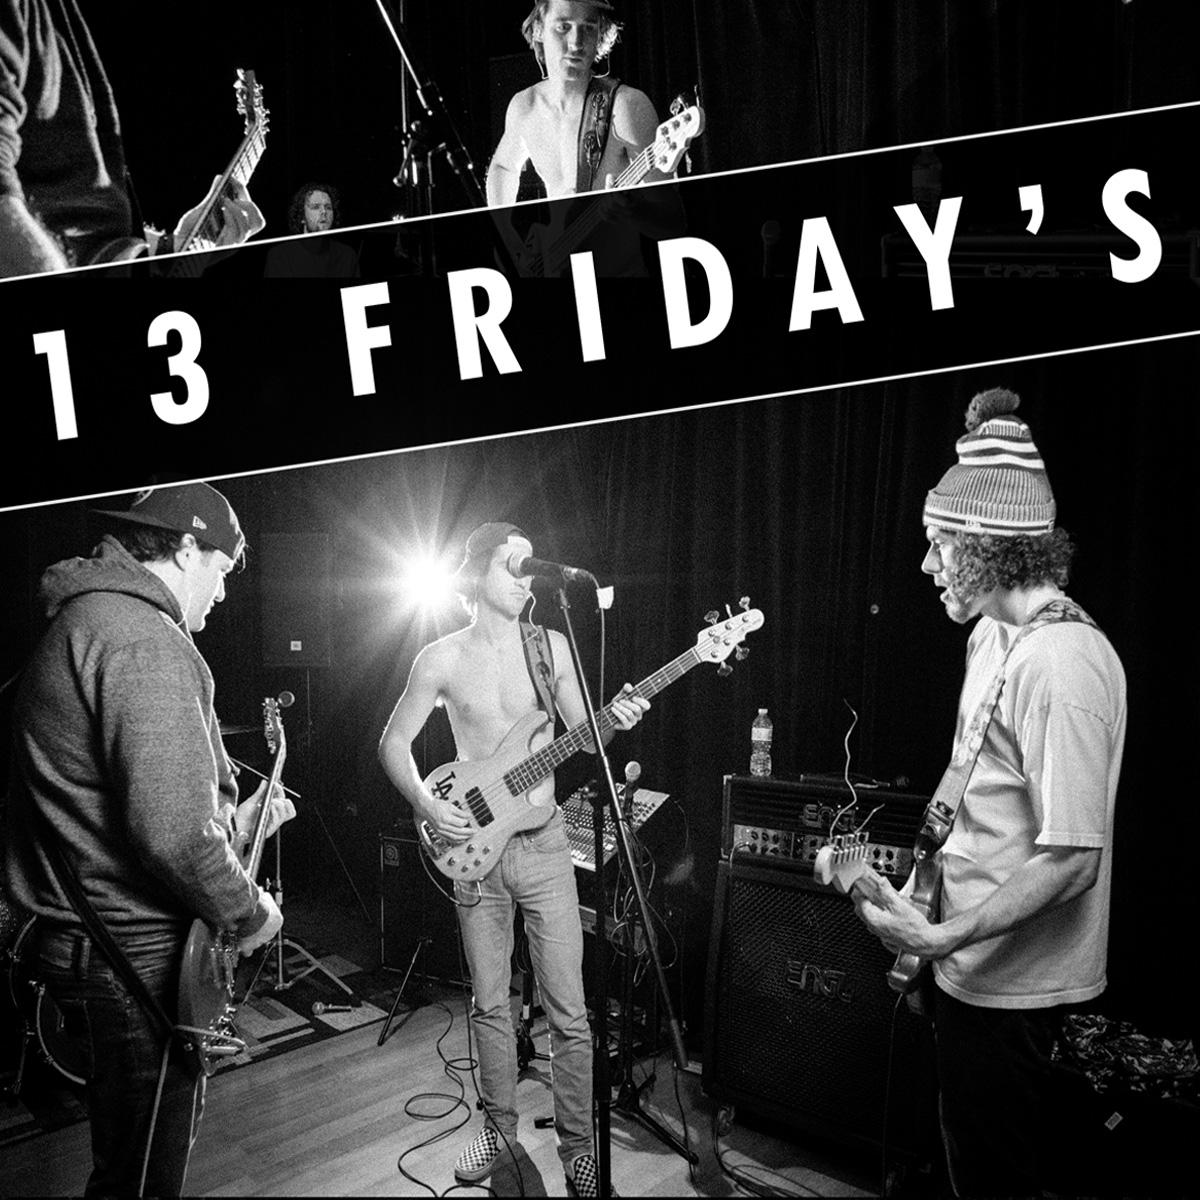 13 Friday's: Main Image